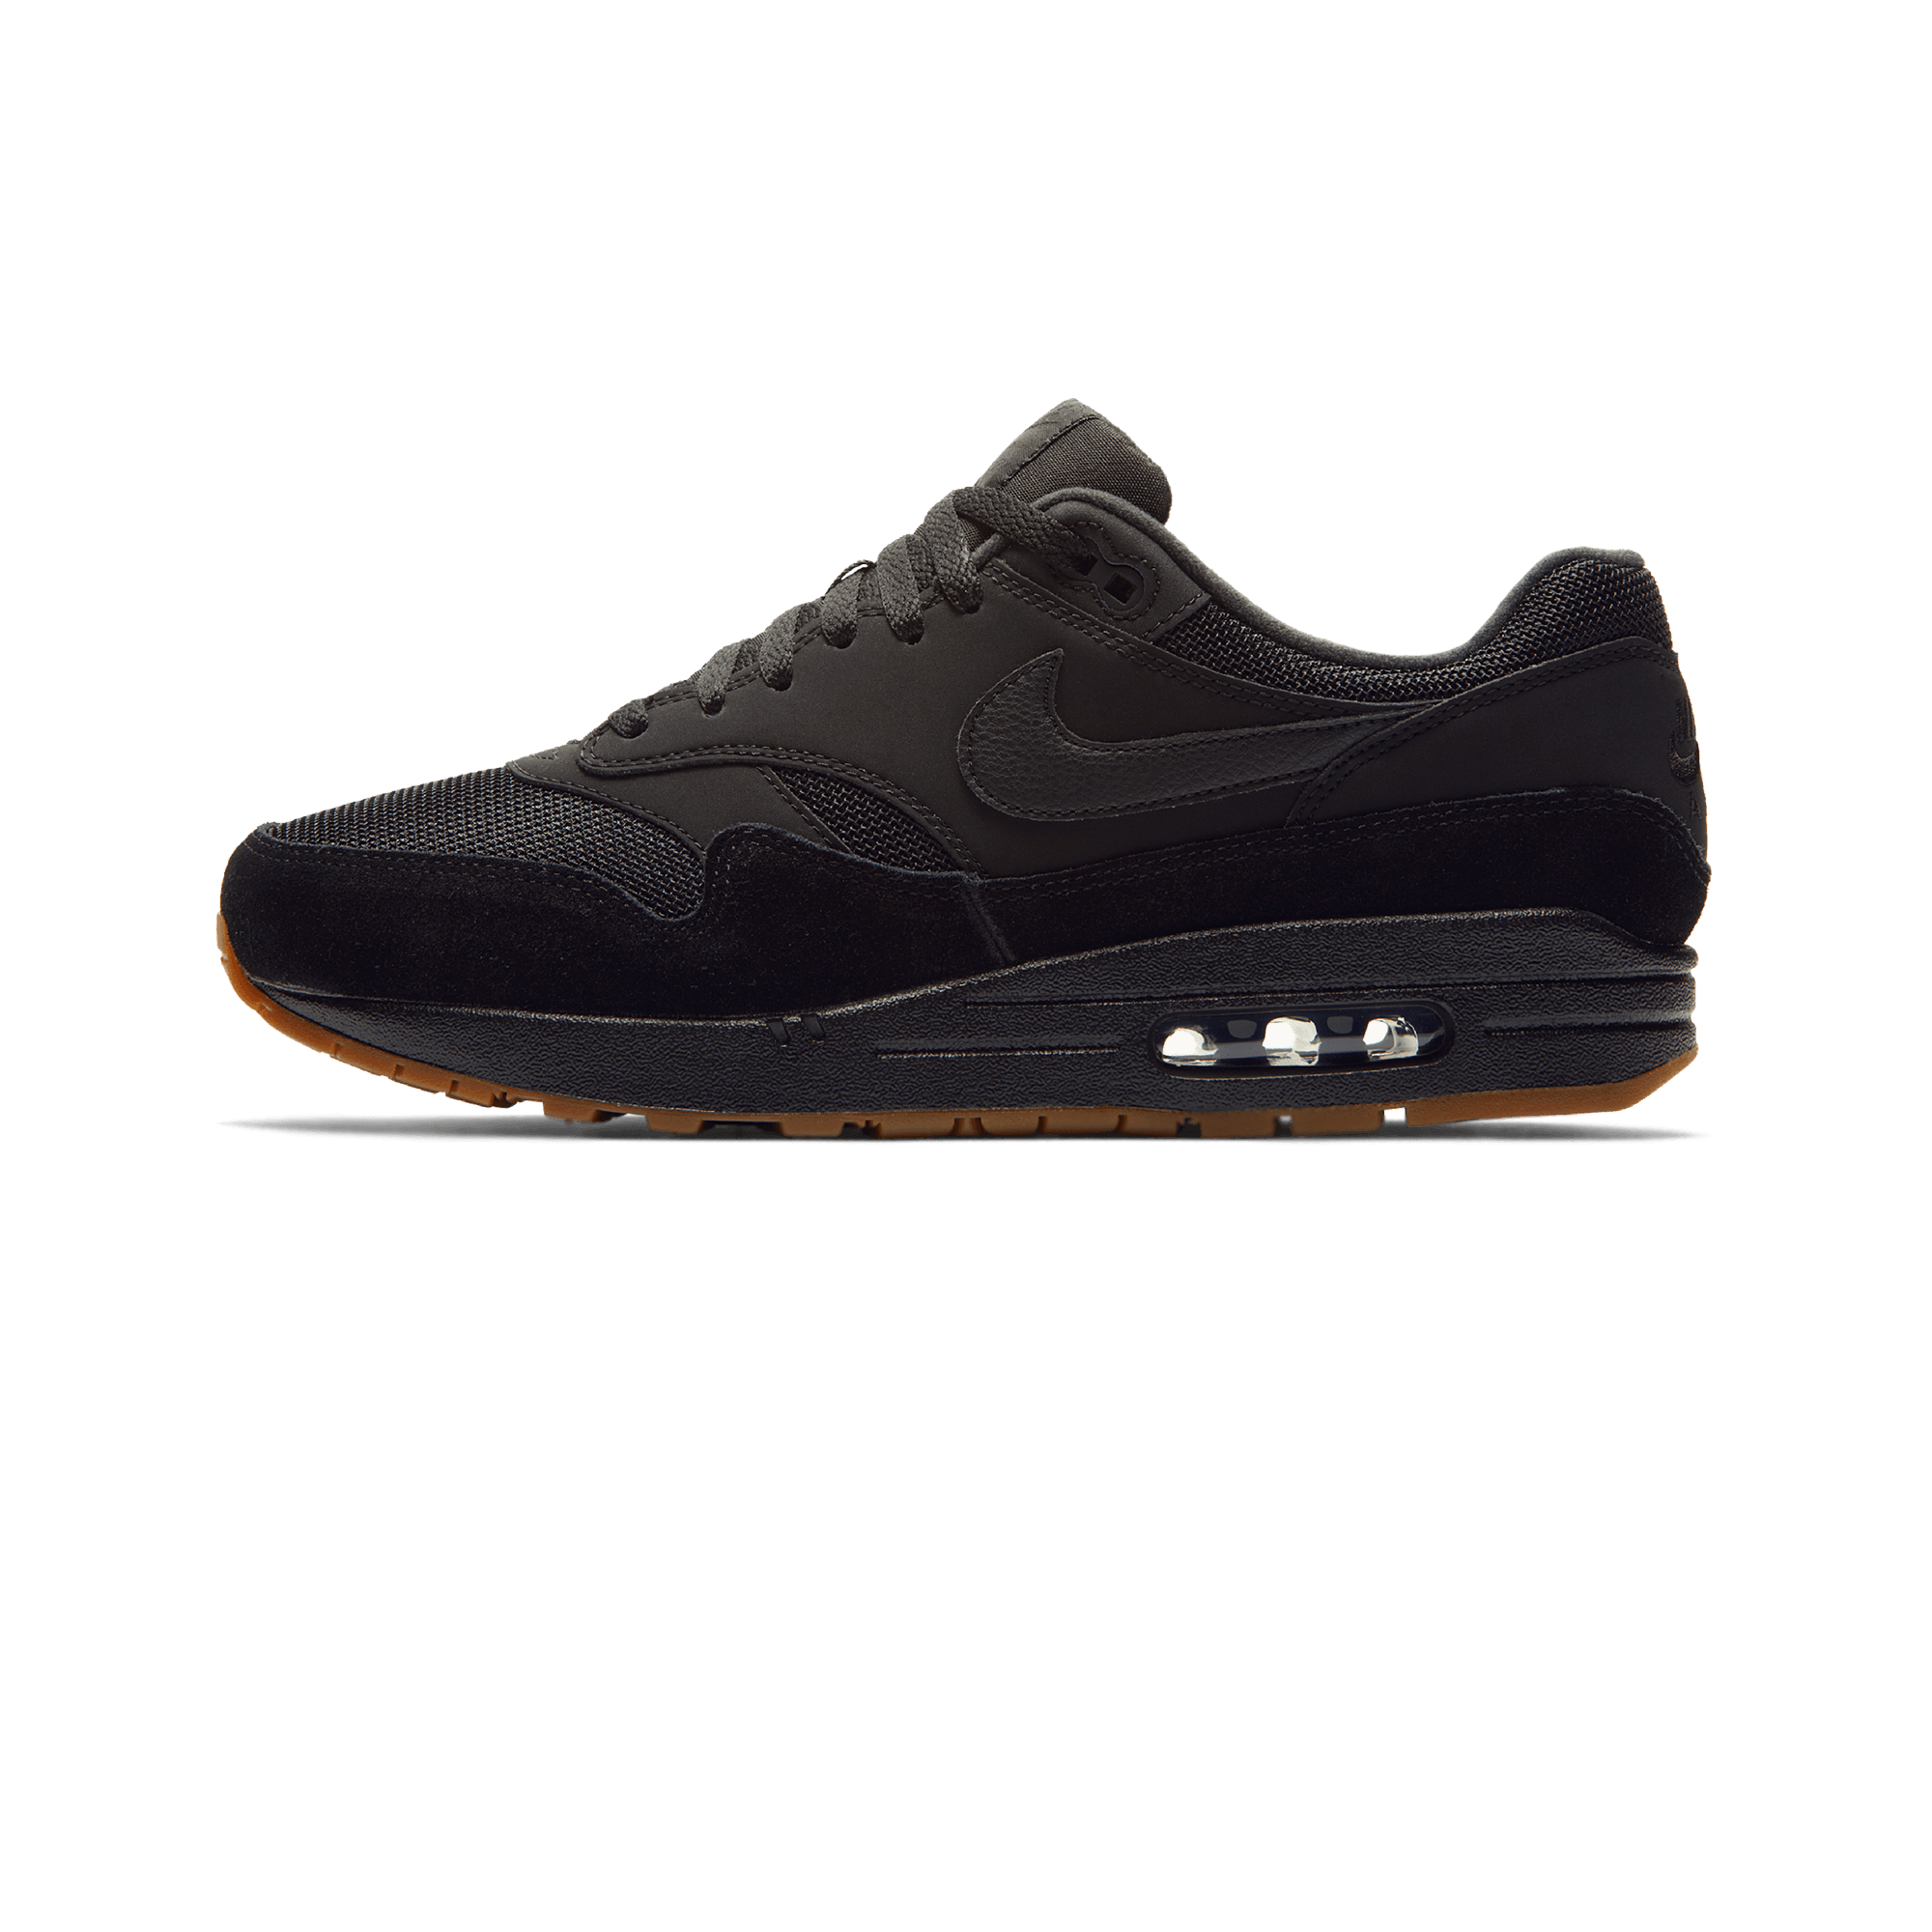 Med 1 Black Nike Max Gum Air Uomo Brown 2EHIWD9